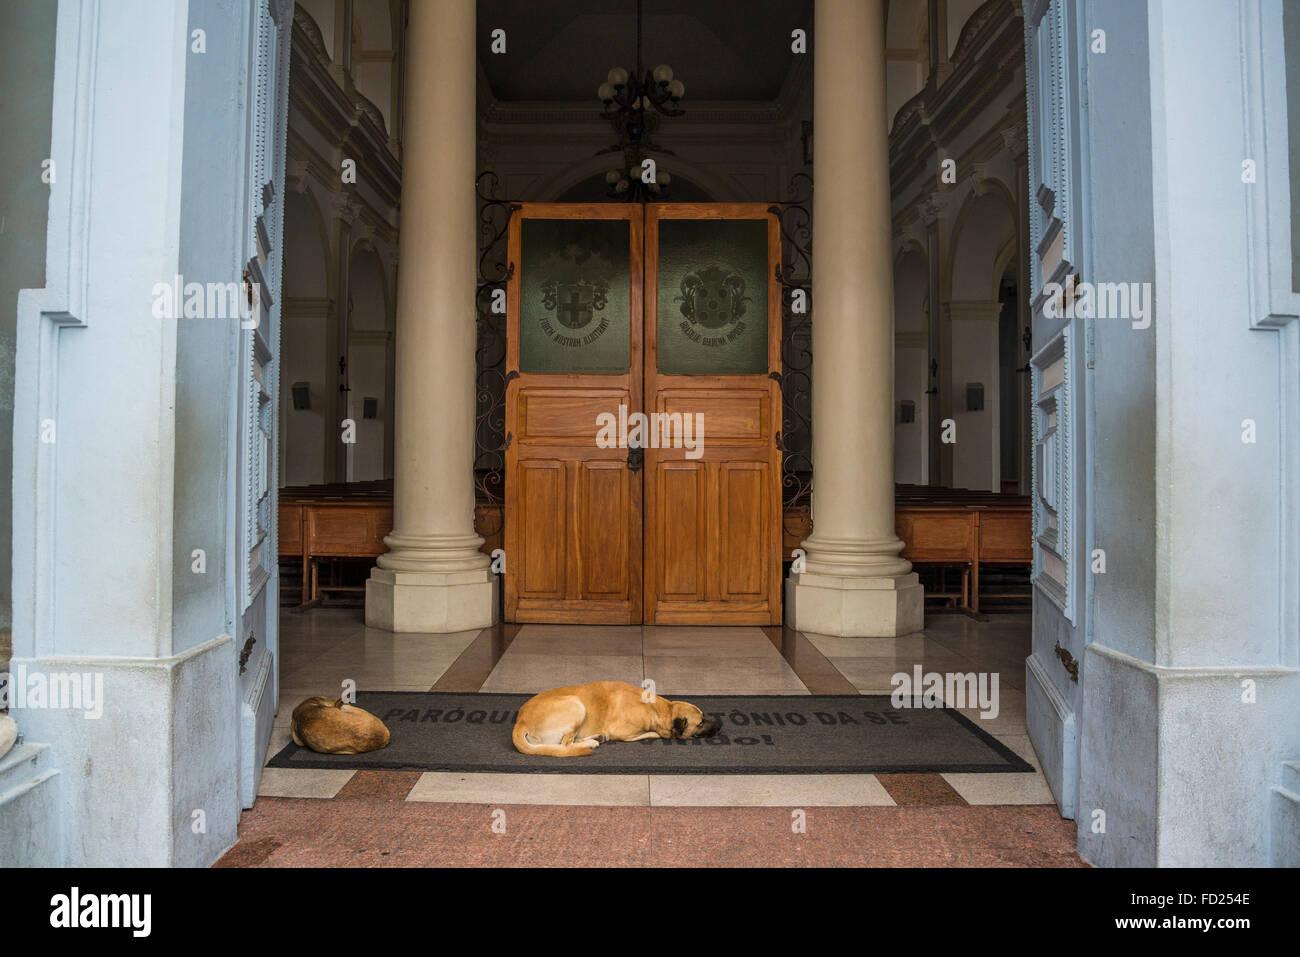 Dogs sleeping in front of, Catedral Metropolitana, Santo Antonio Cathedral, Diamantina, Minas Gerais, Brazil - Stock Image